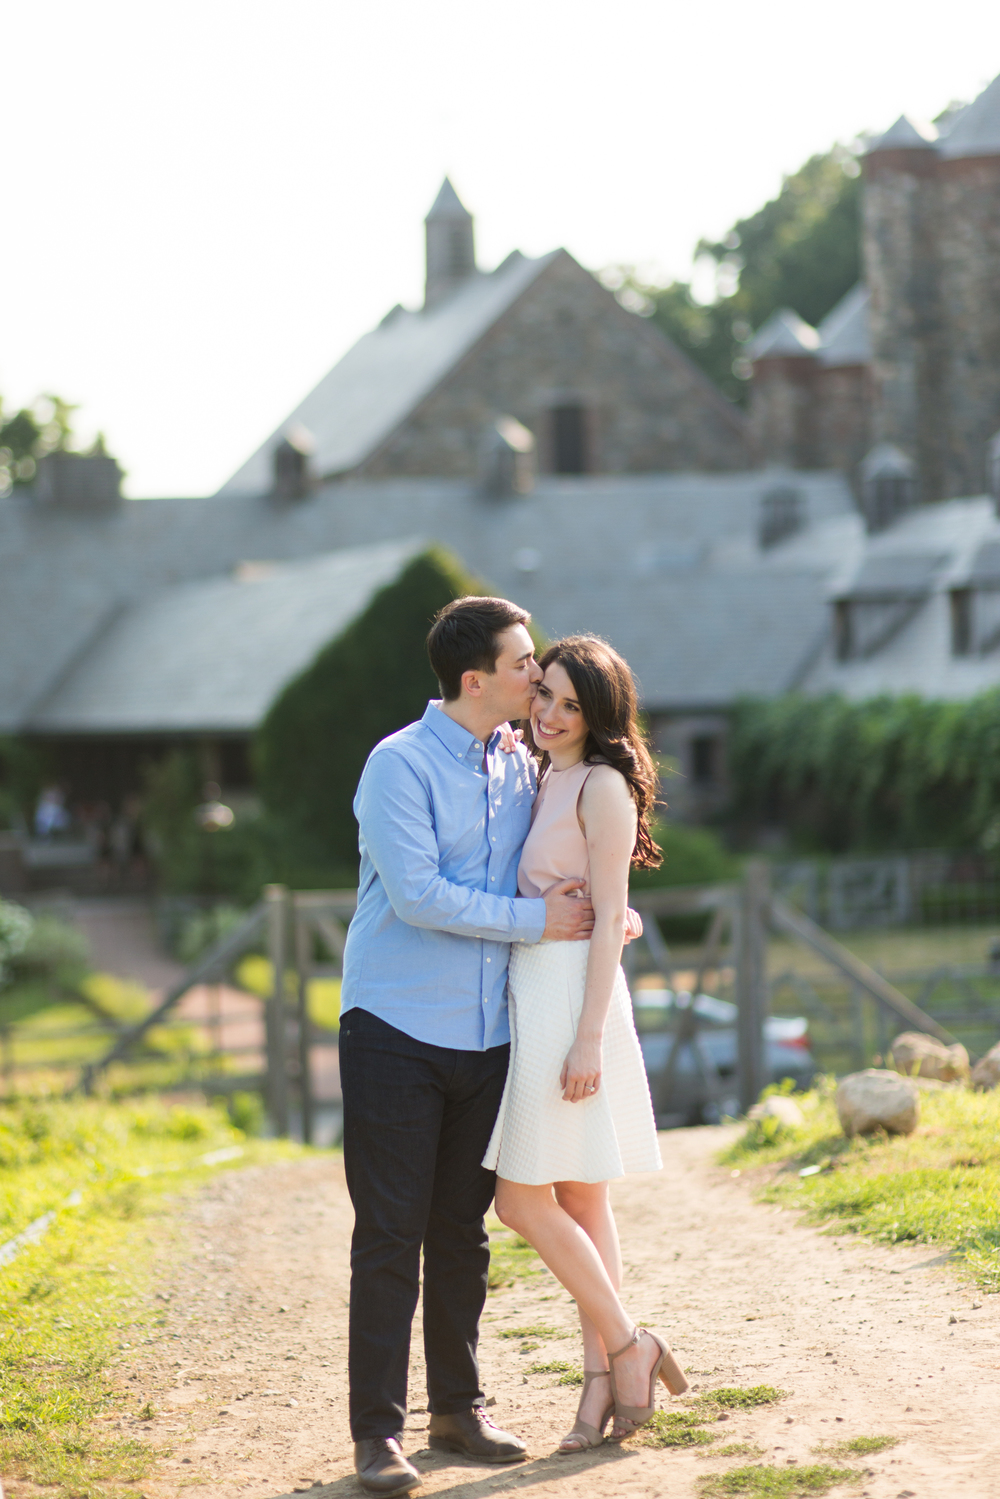 Emily&Aaron_Engagement159.JPG